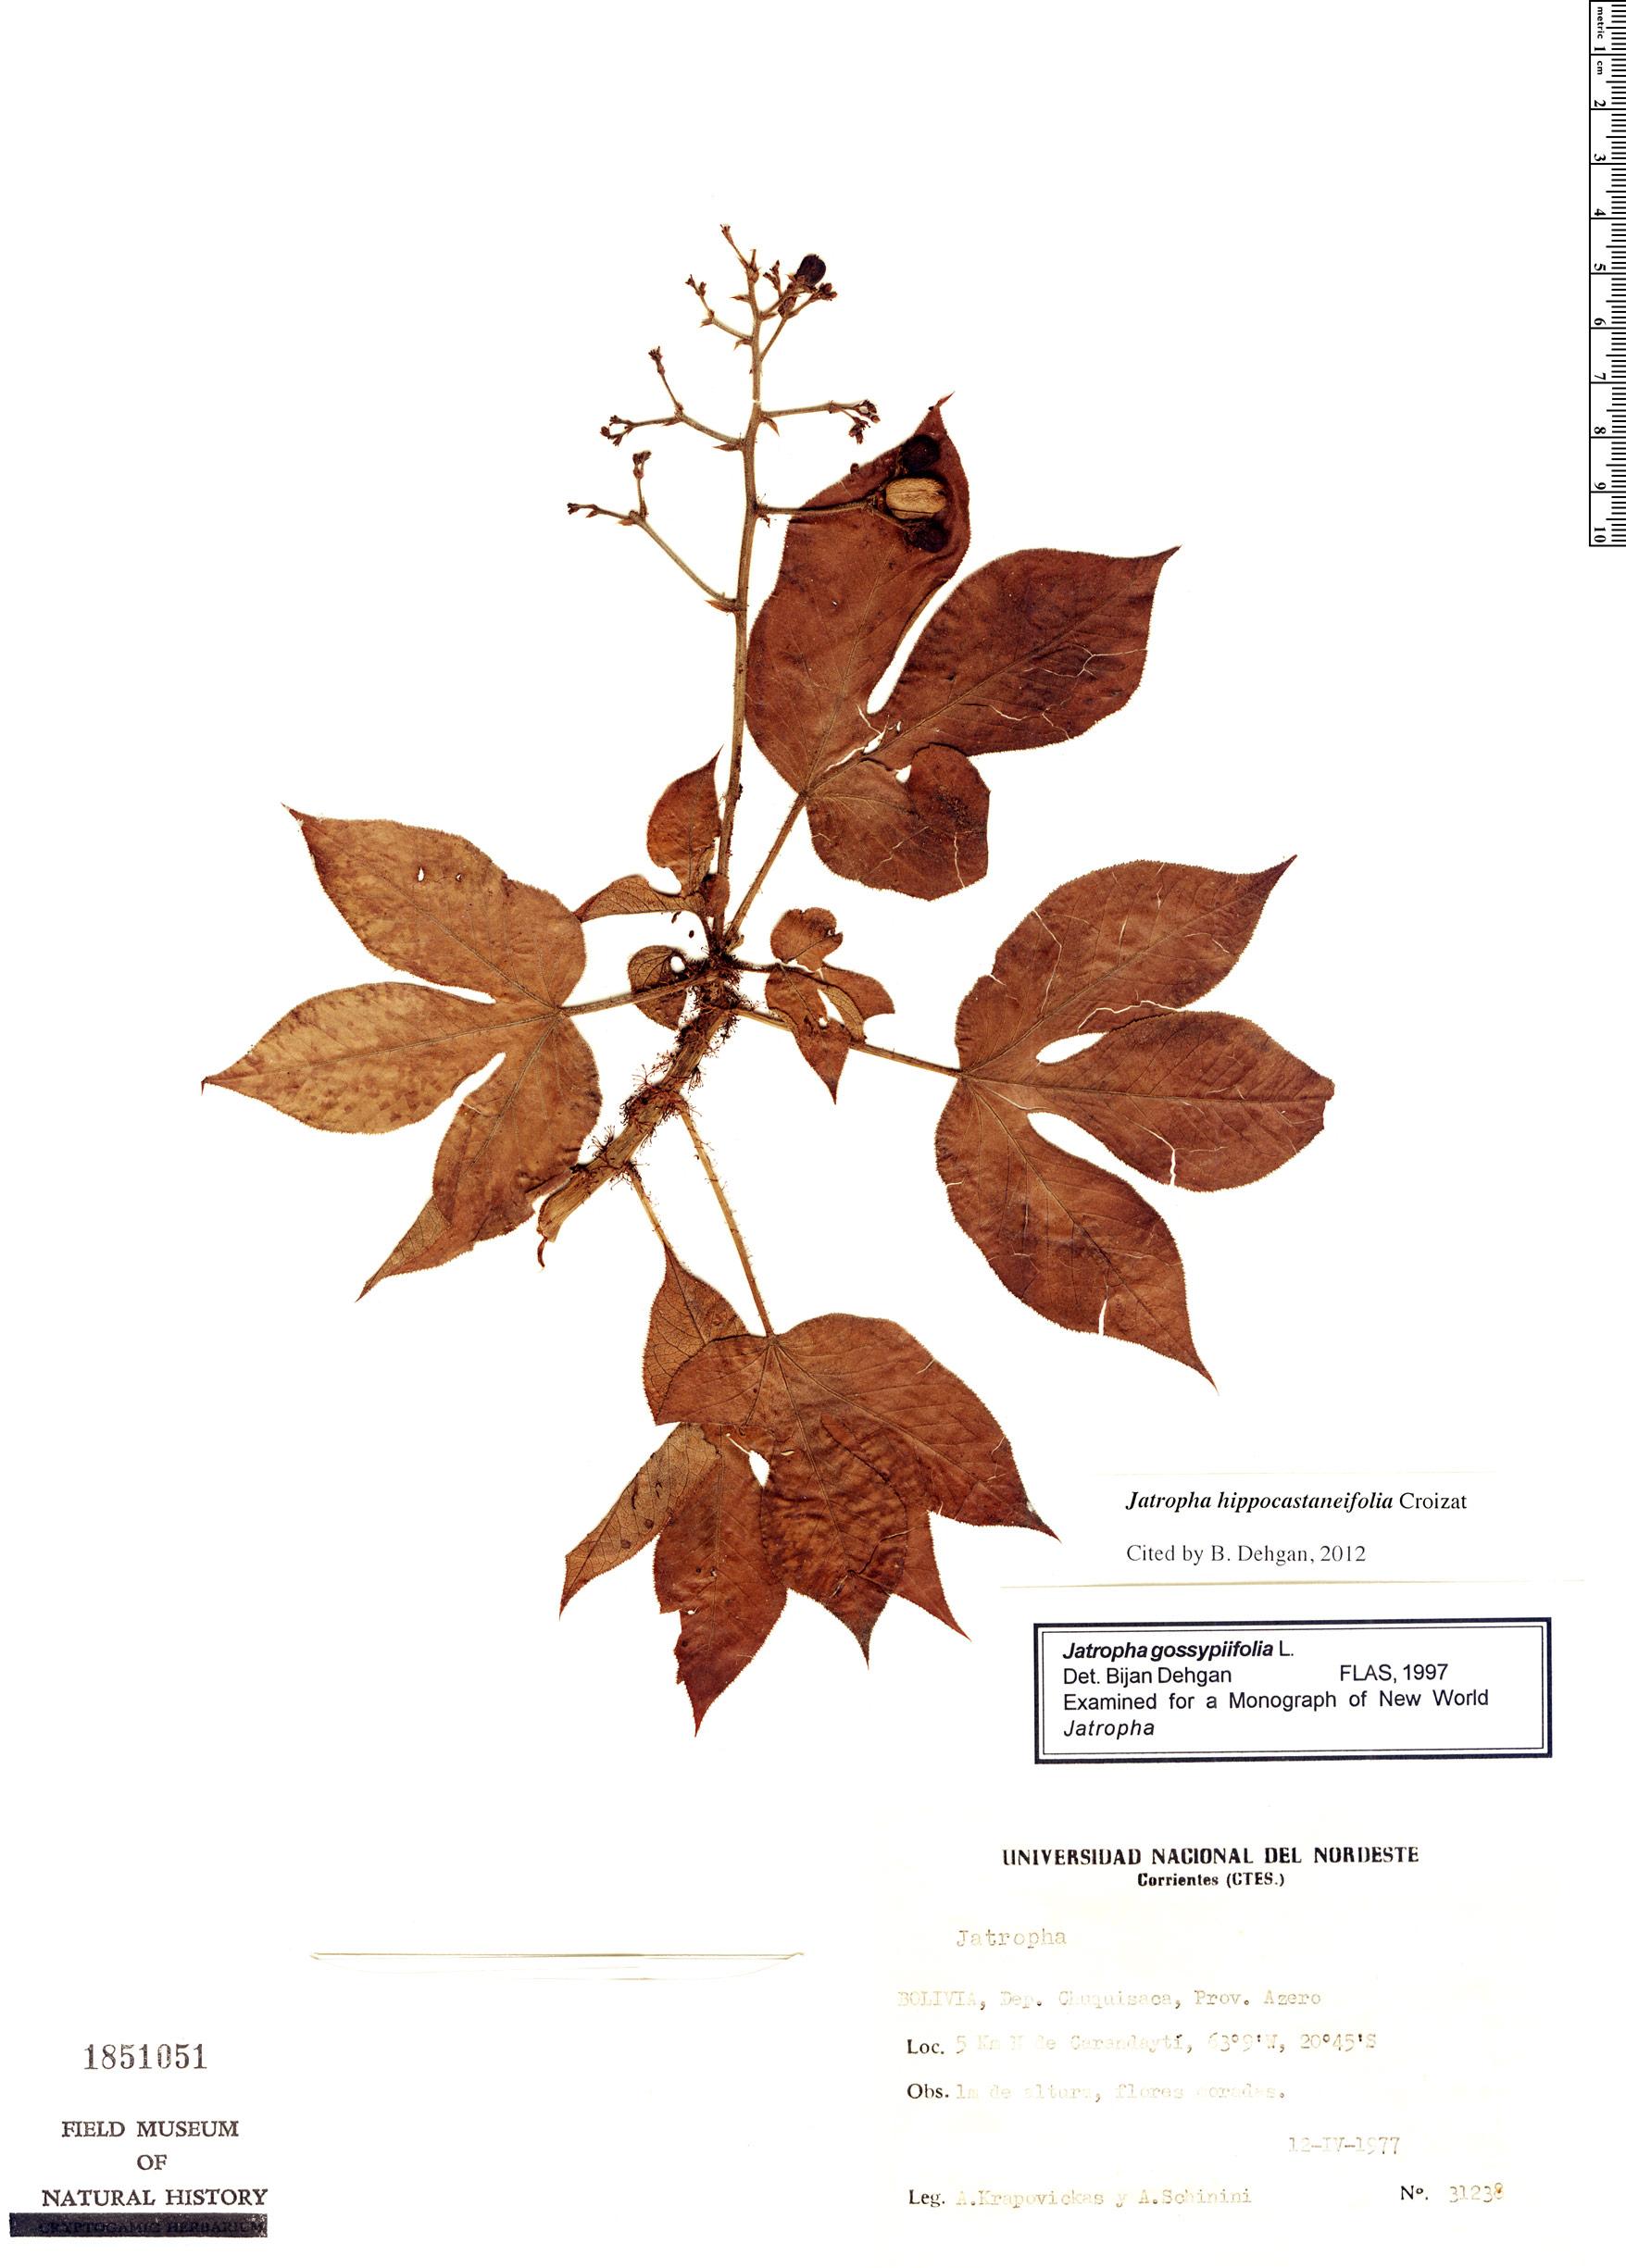 Specimen: Jatropha hippocastanifolia